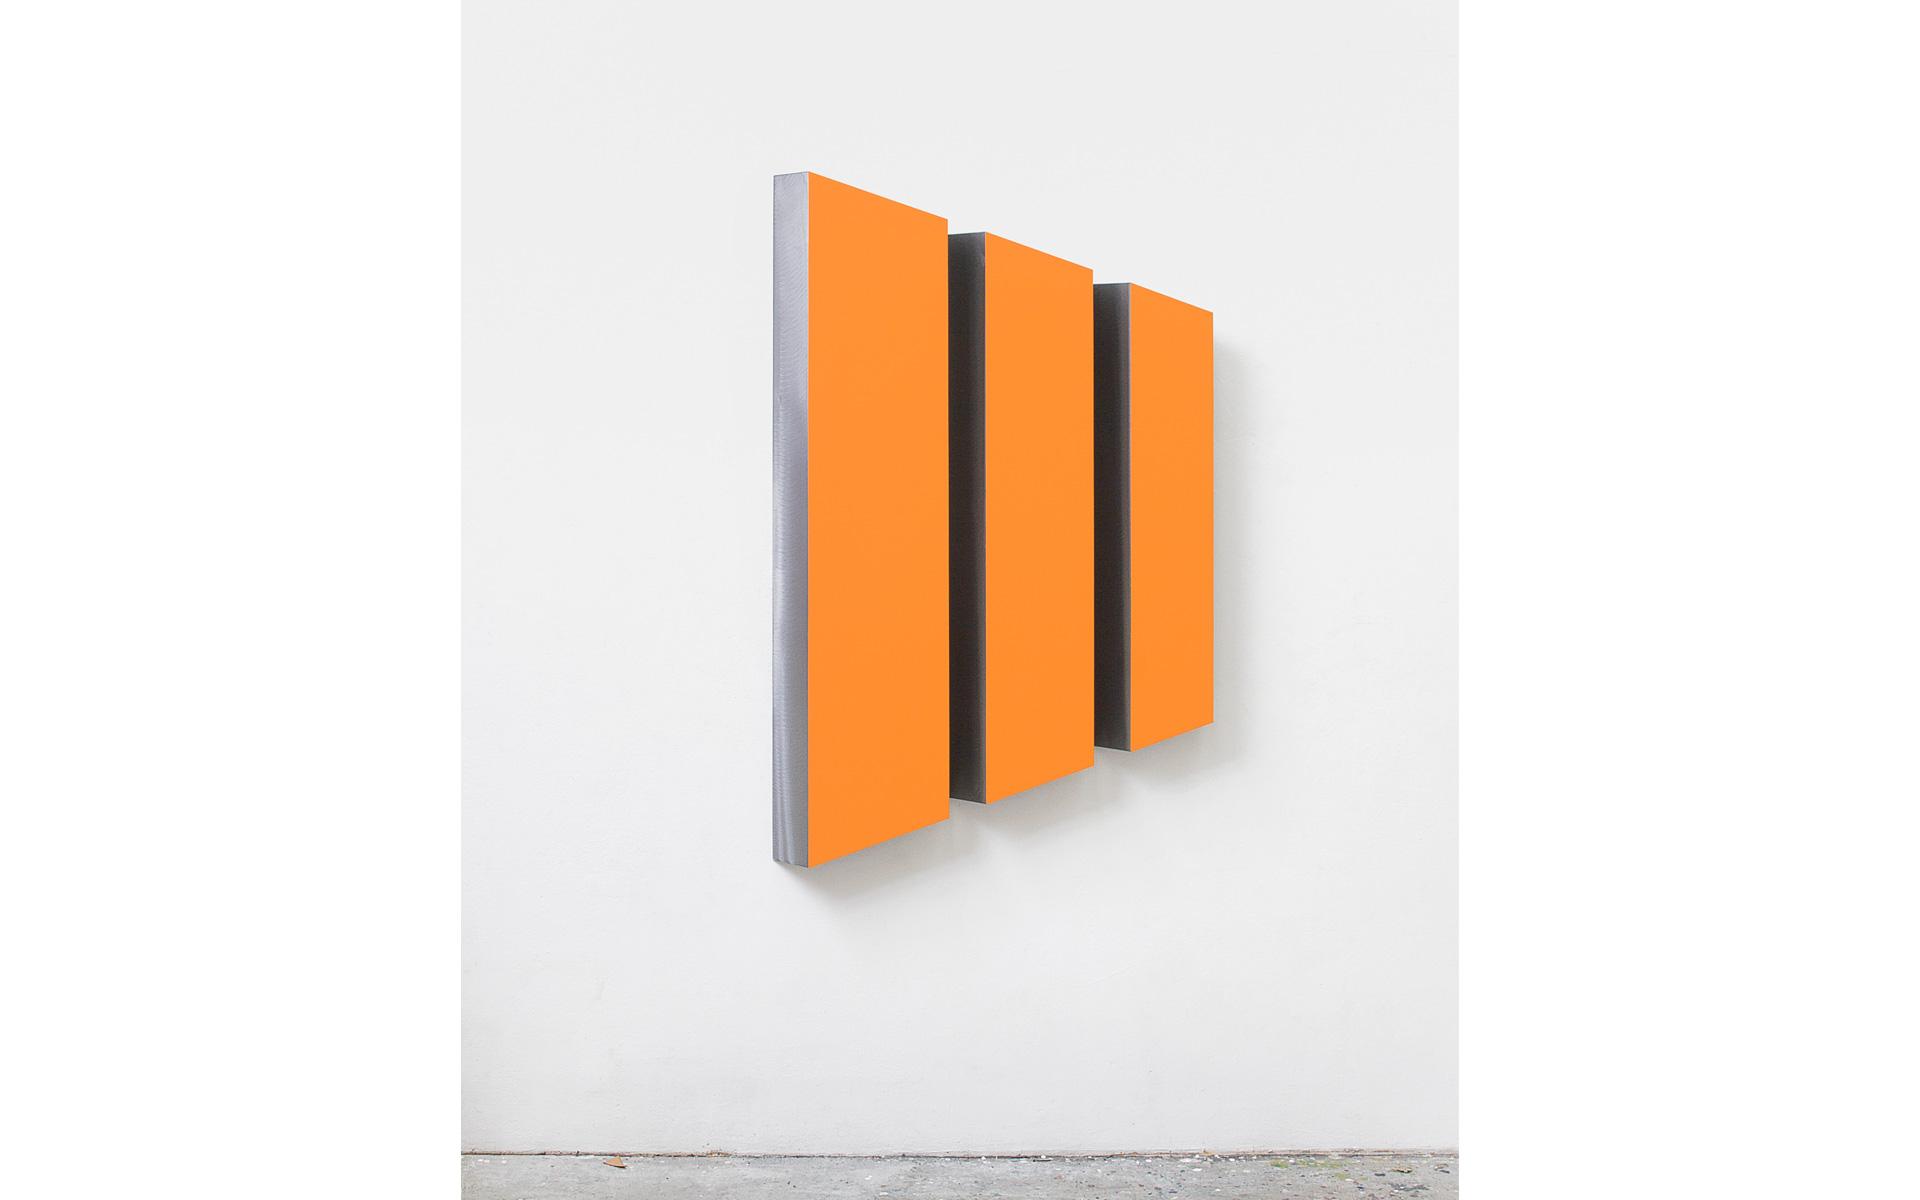 PASSEO, three parts, 2008 Acrylic on steel 150.3 × 95.5 × 8.5 cm - Photo: Christoph Valentien